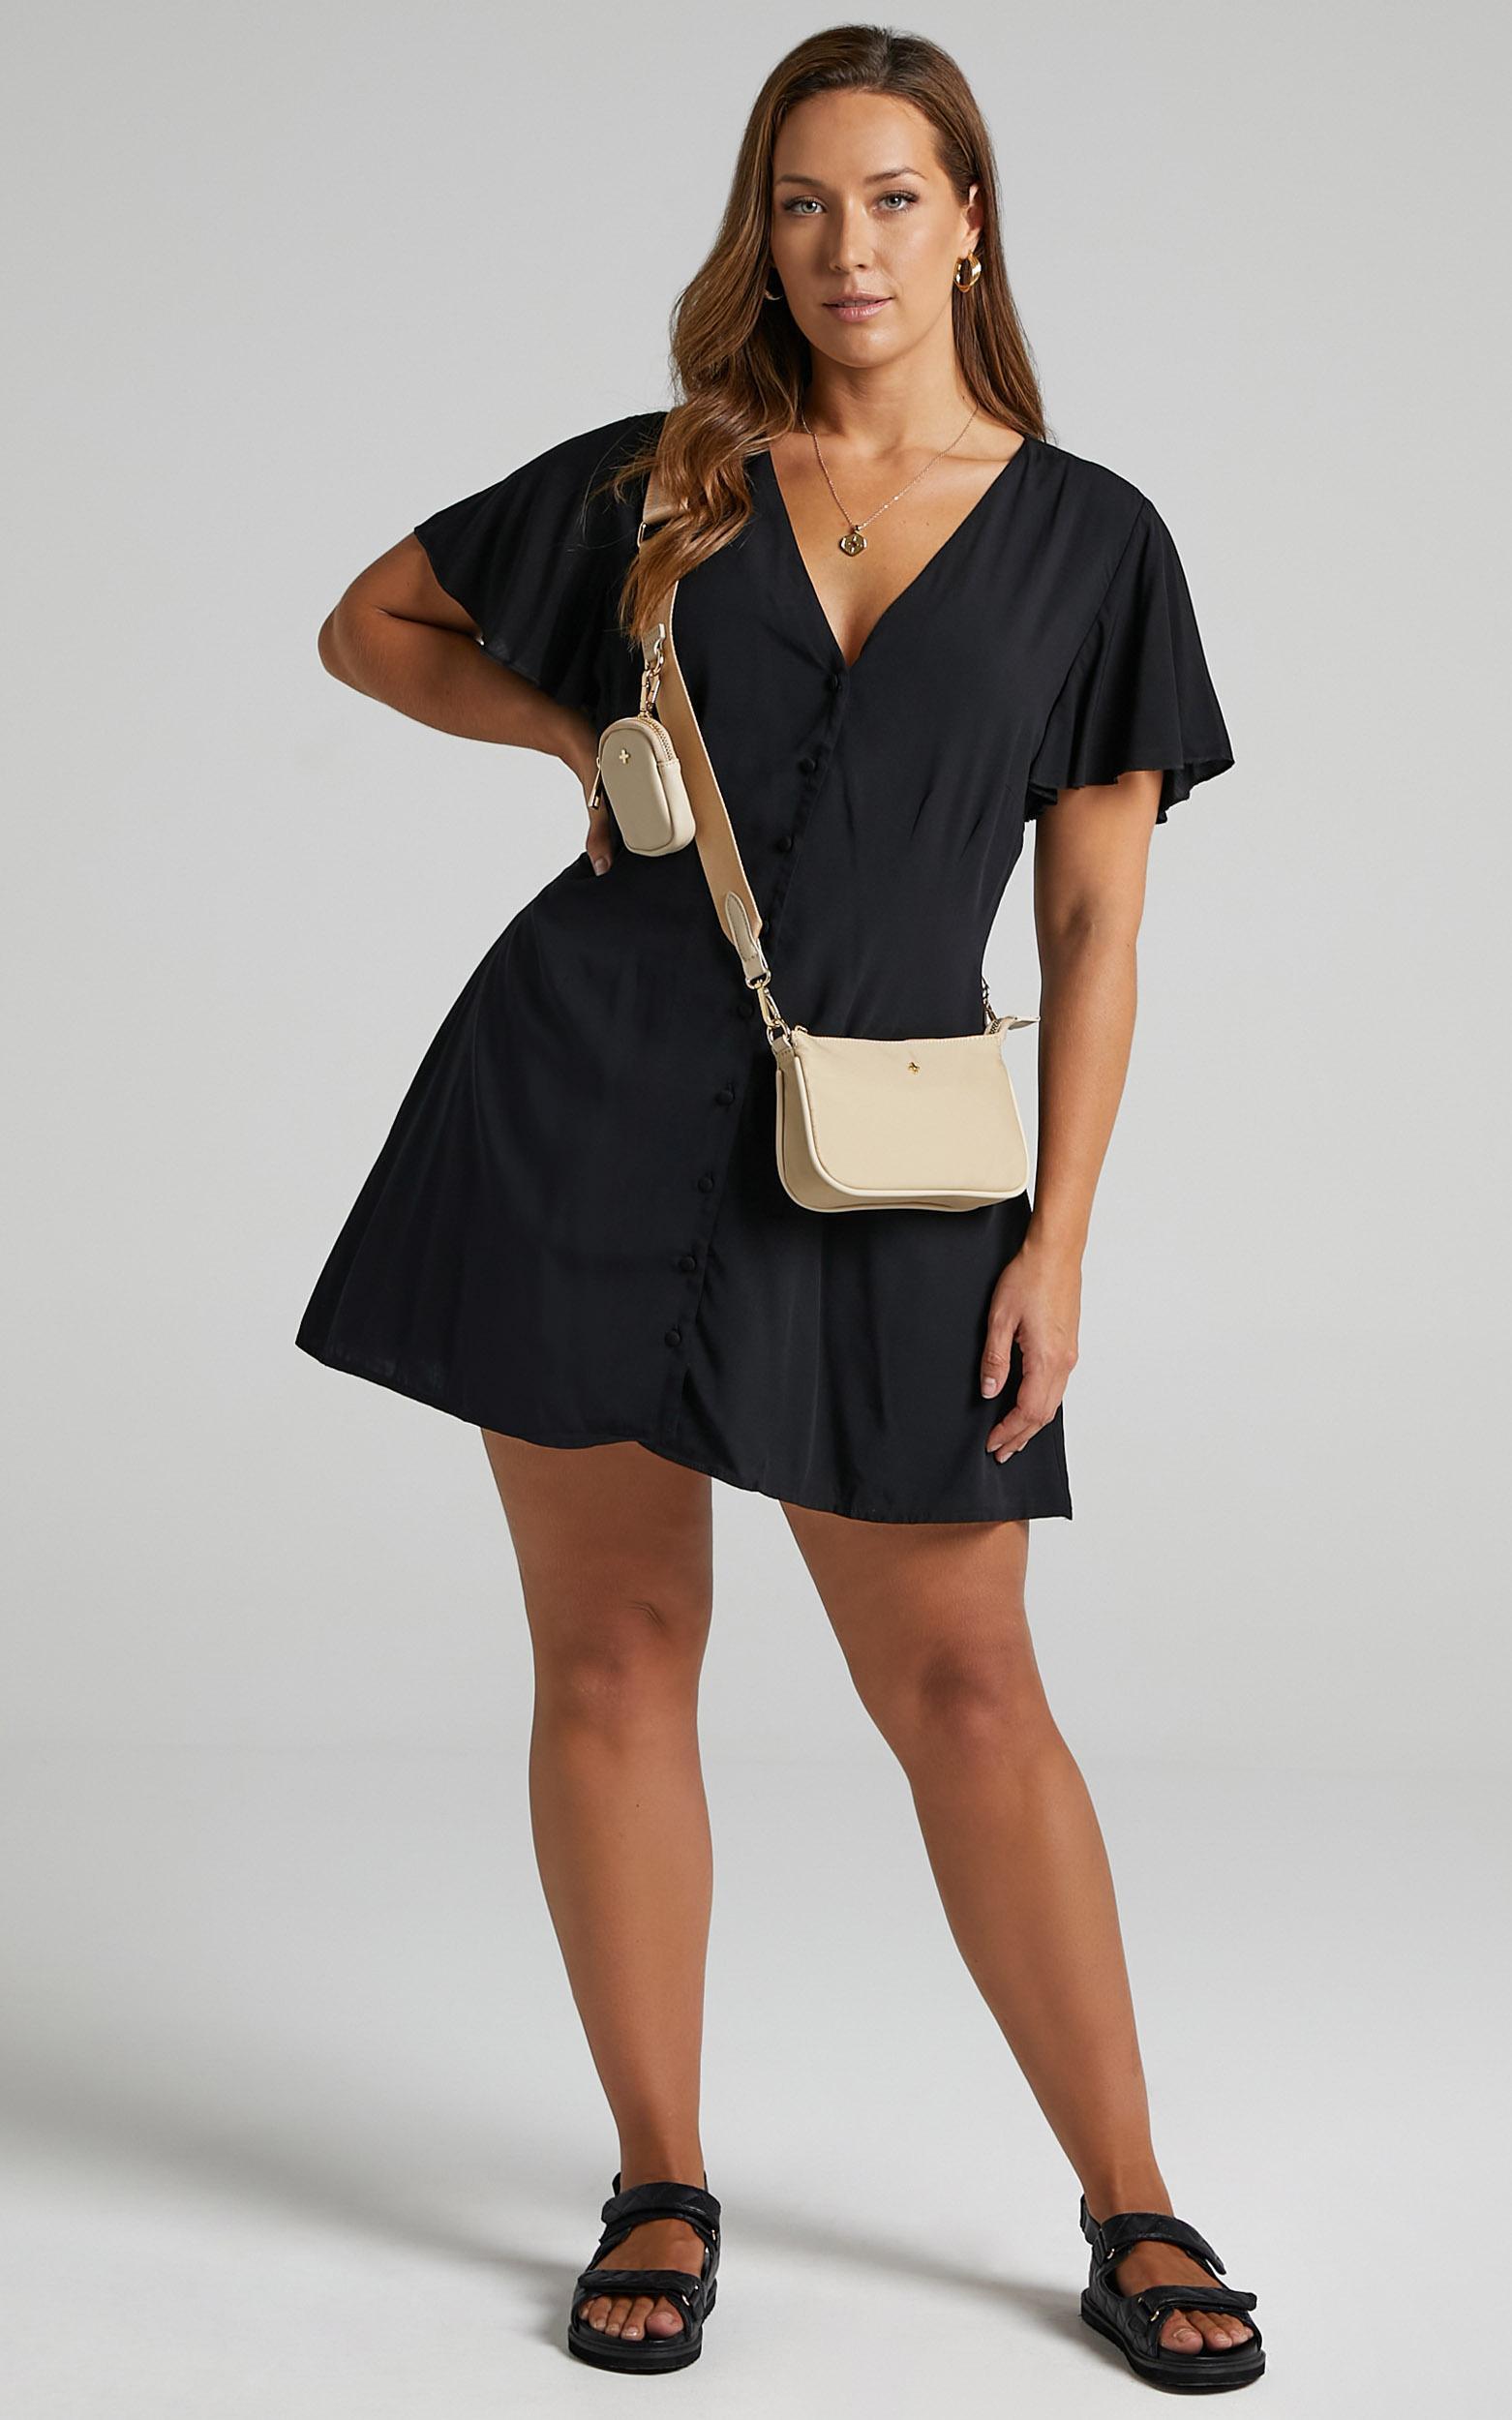 Daiquiri Dress in Black - 6 (XS), Black, hi-res image number null